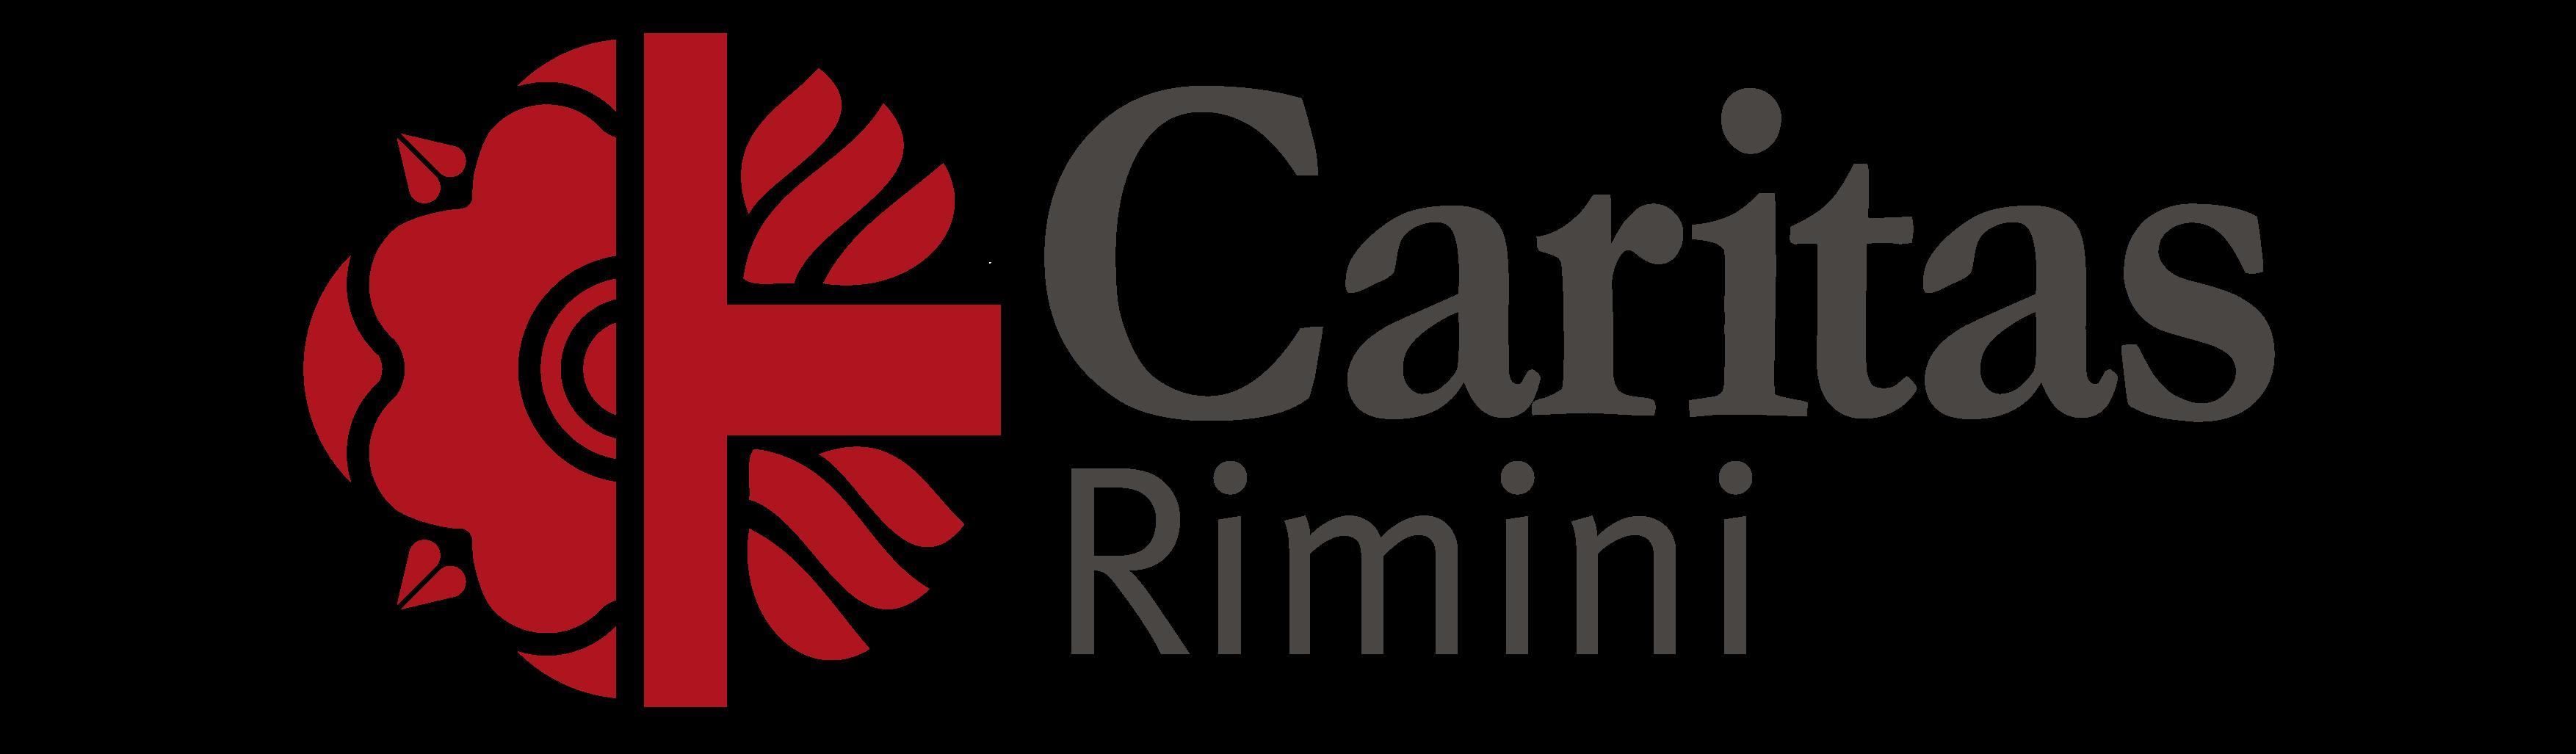 Caritas Diocesana Rimini